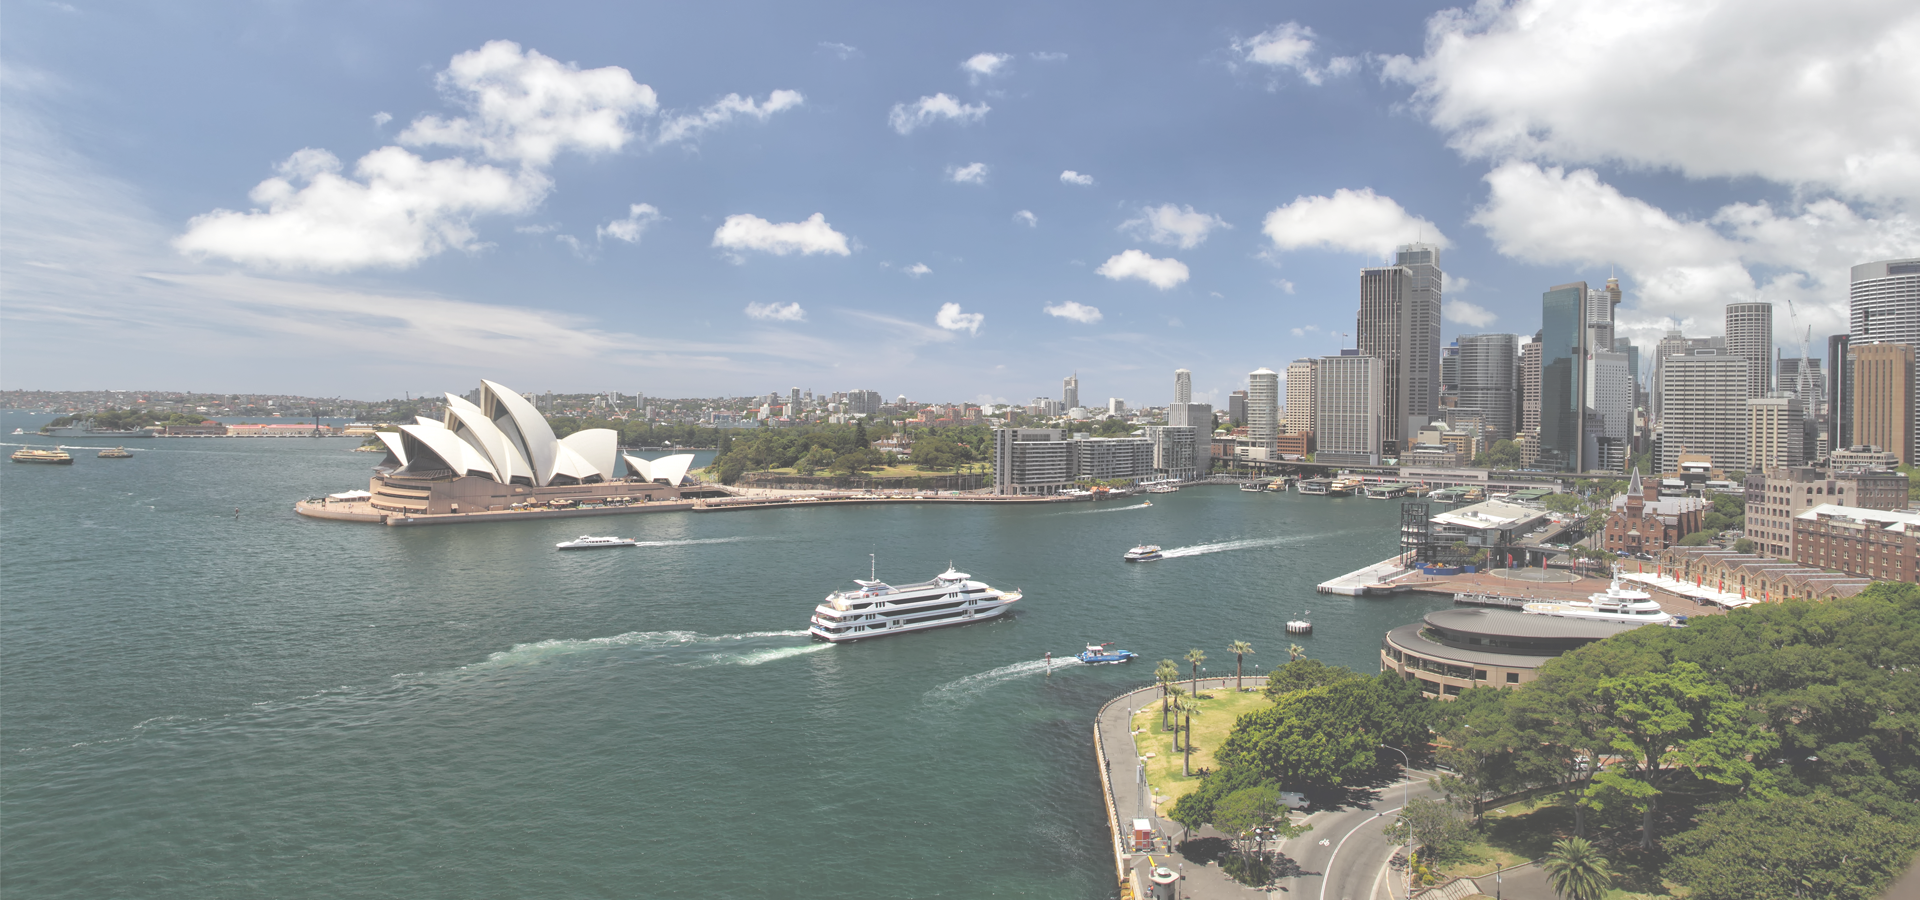 Peer-to-peer advisory in Newcastle, NSW, New South Wales, Australia